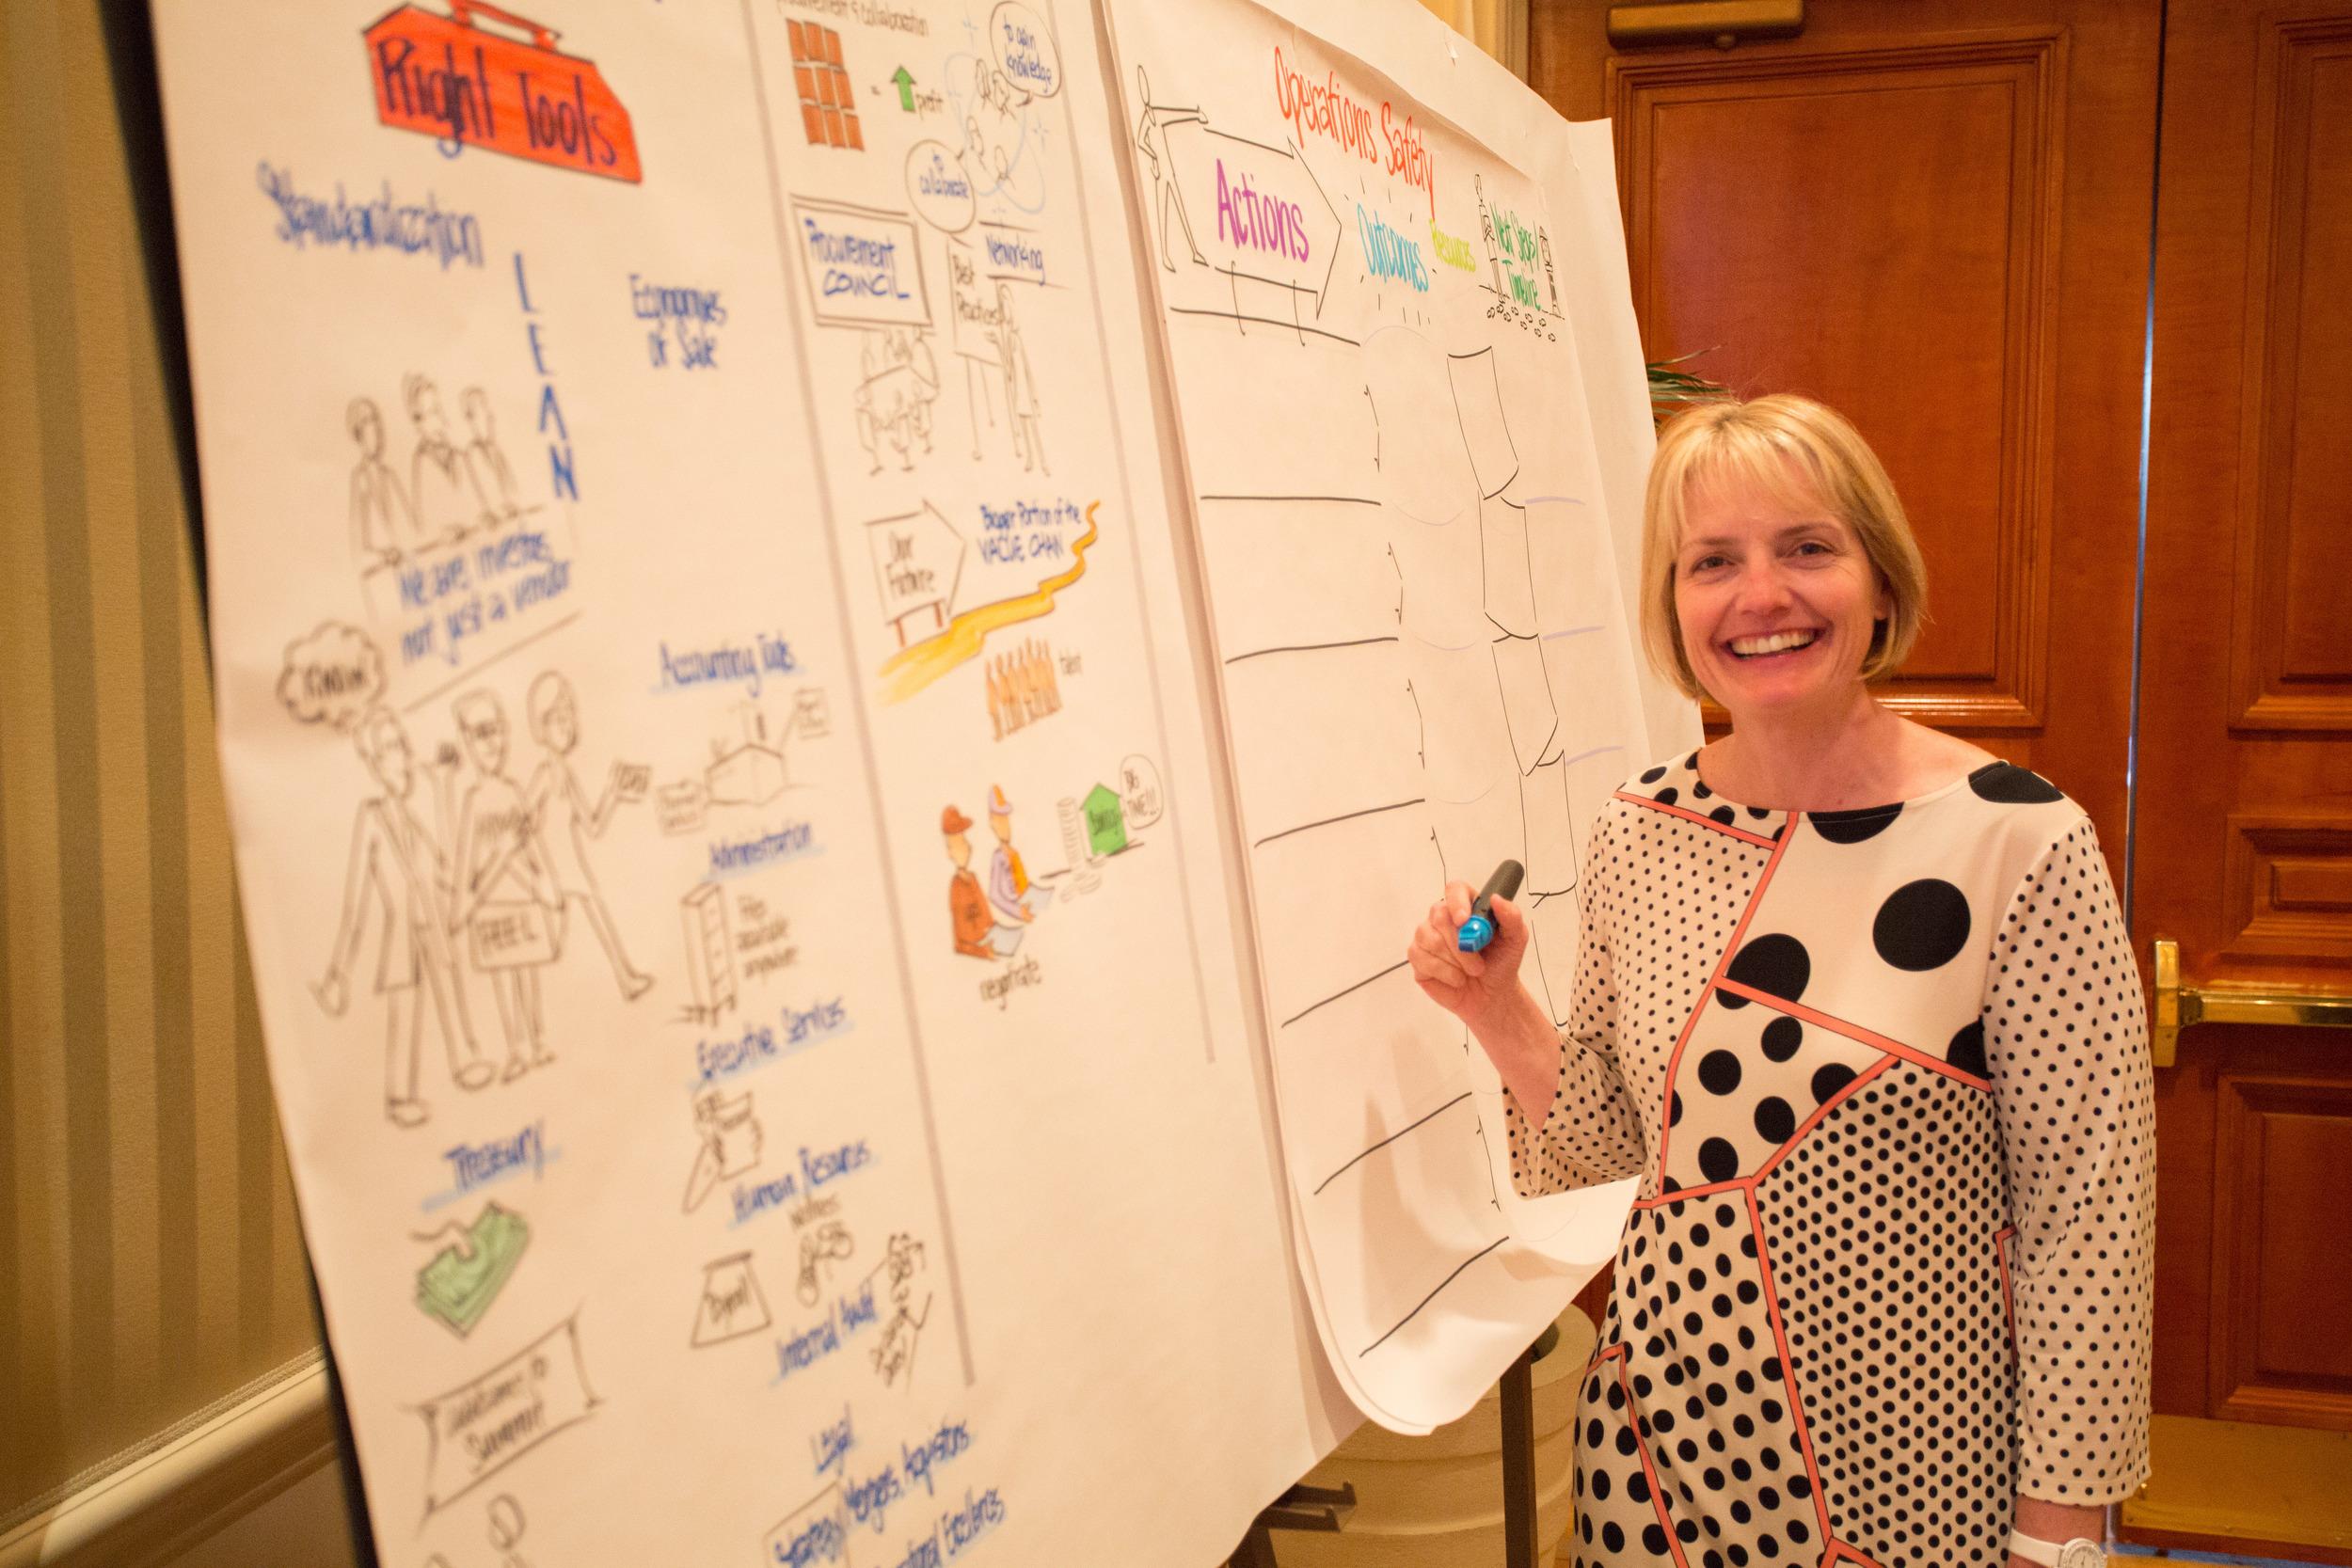 KAWSteel Partners CEO Summit action plan drawing  -516.jpg